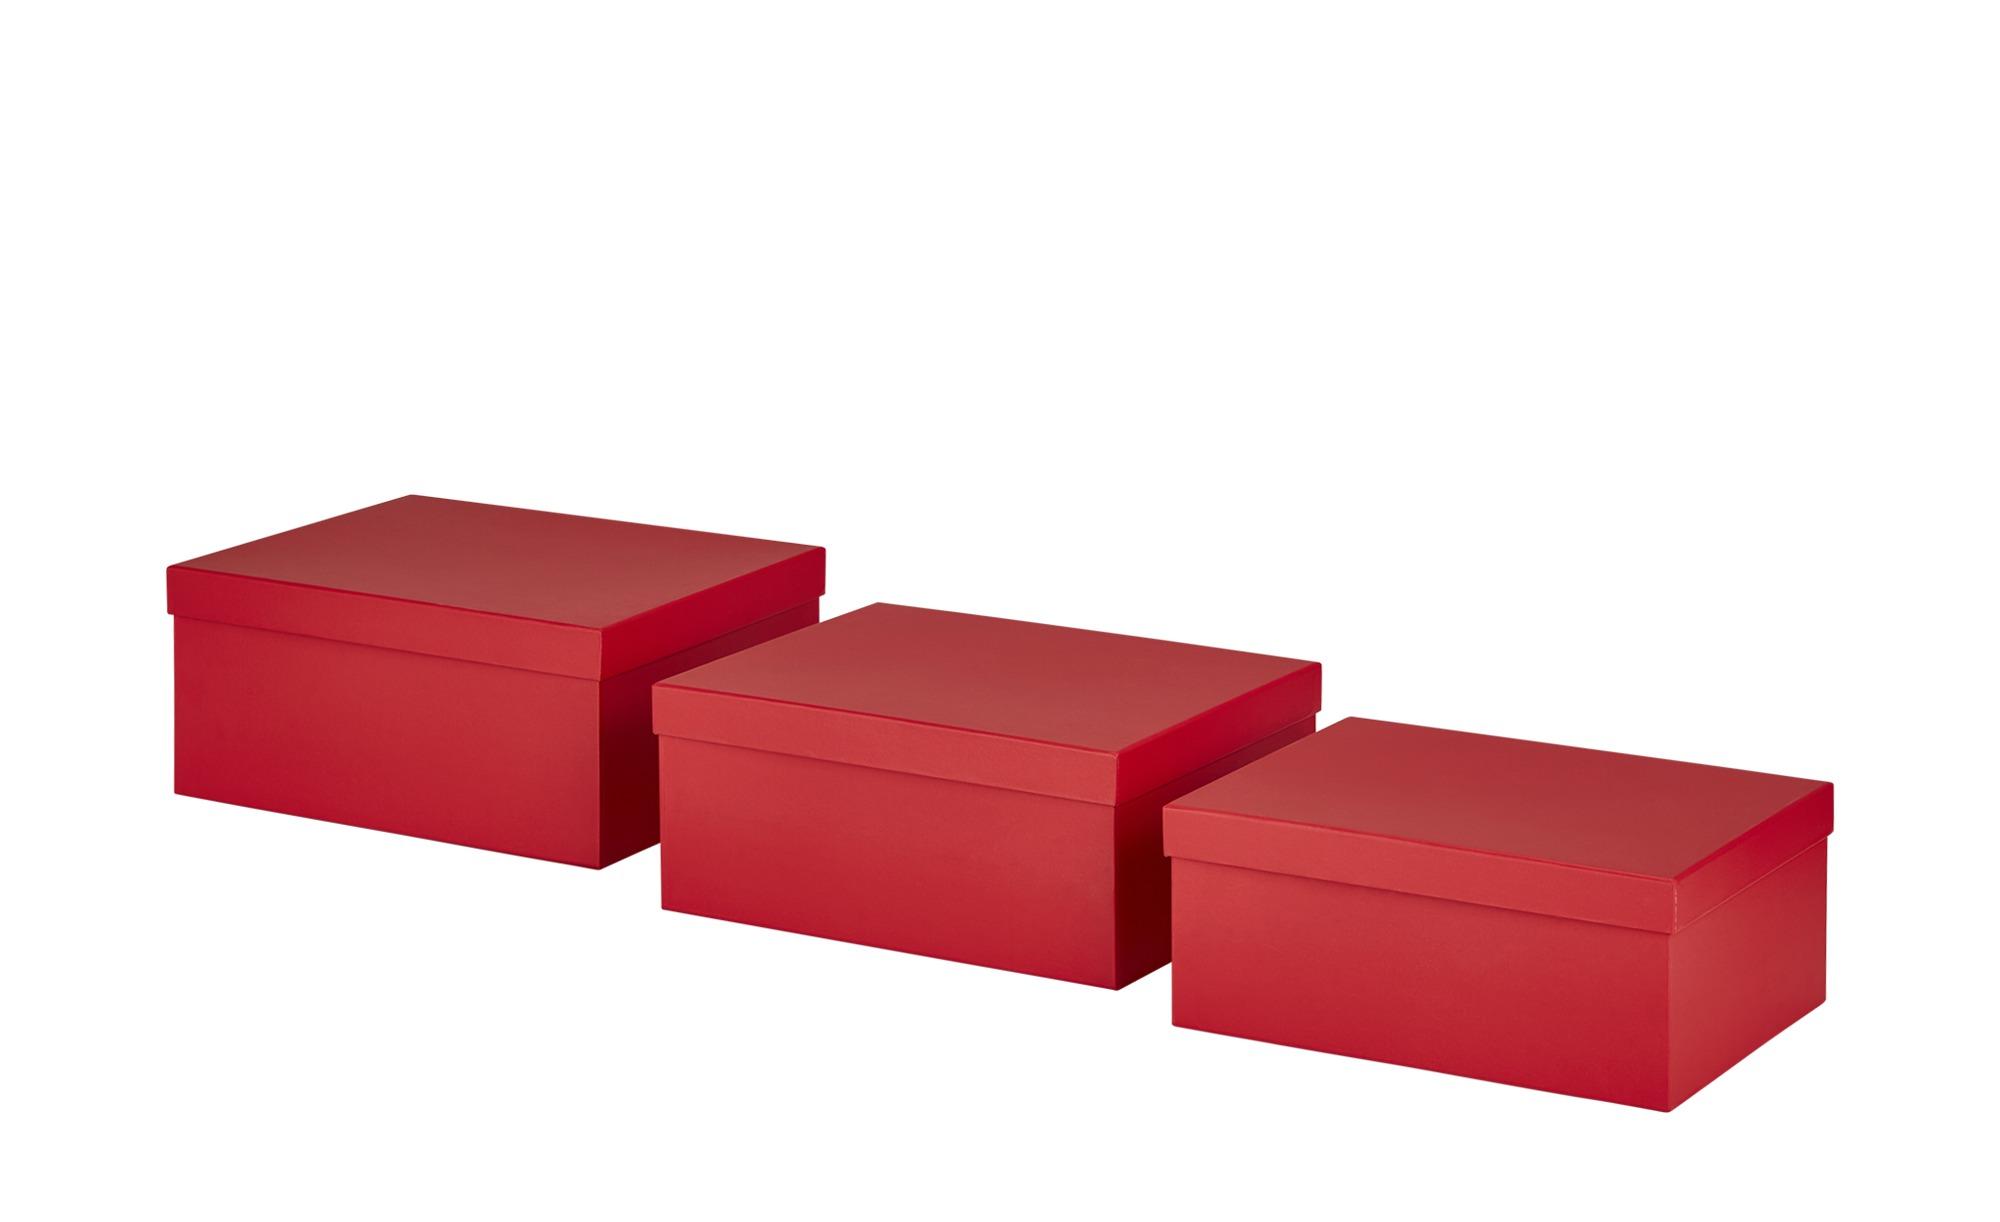 Aufbewahrungsboxen, 3er-Set ¦ rot ¦ Papier, Pappe ¦ Maße (cm): B: 30 H: 27,5 Regale > Regal-Aufbewahrungsboxen - Höffner